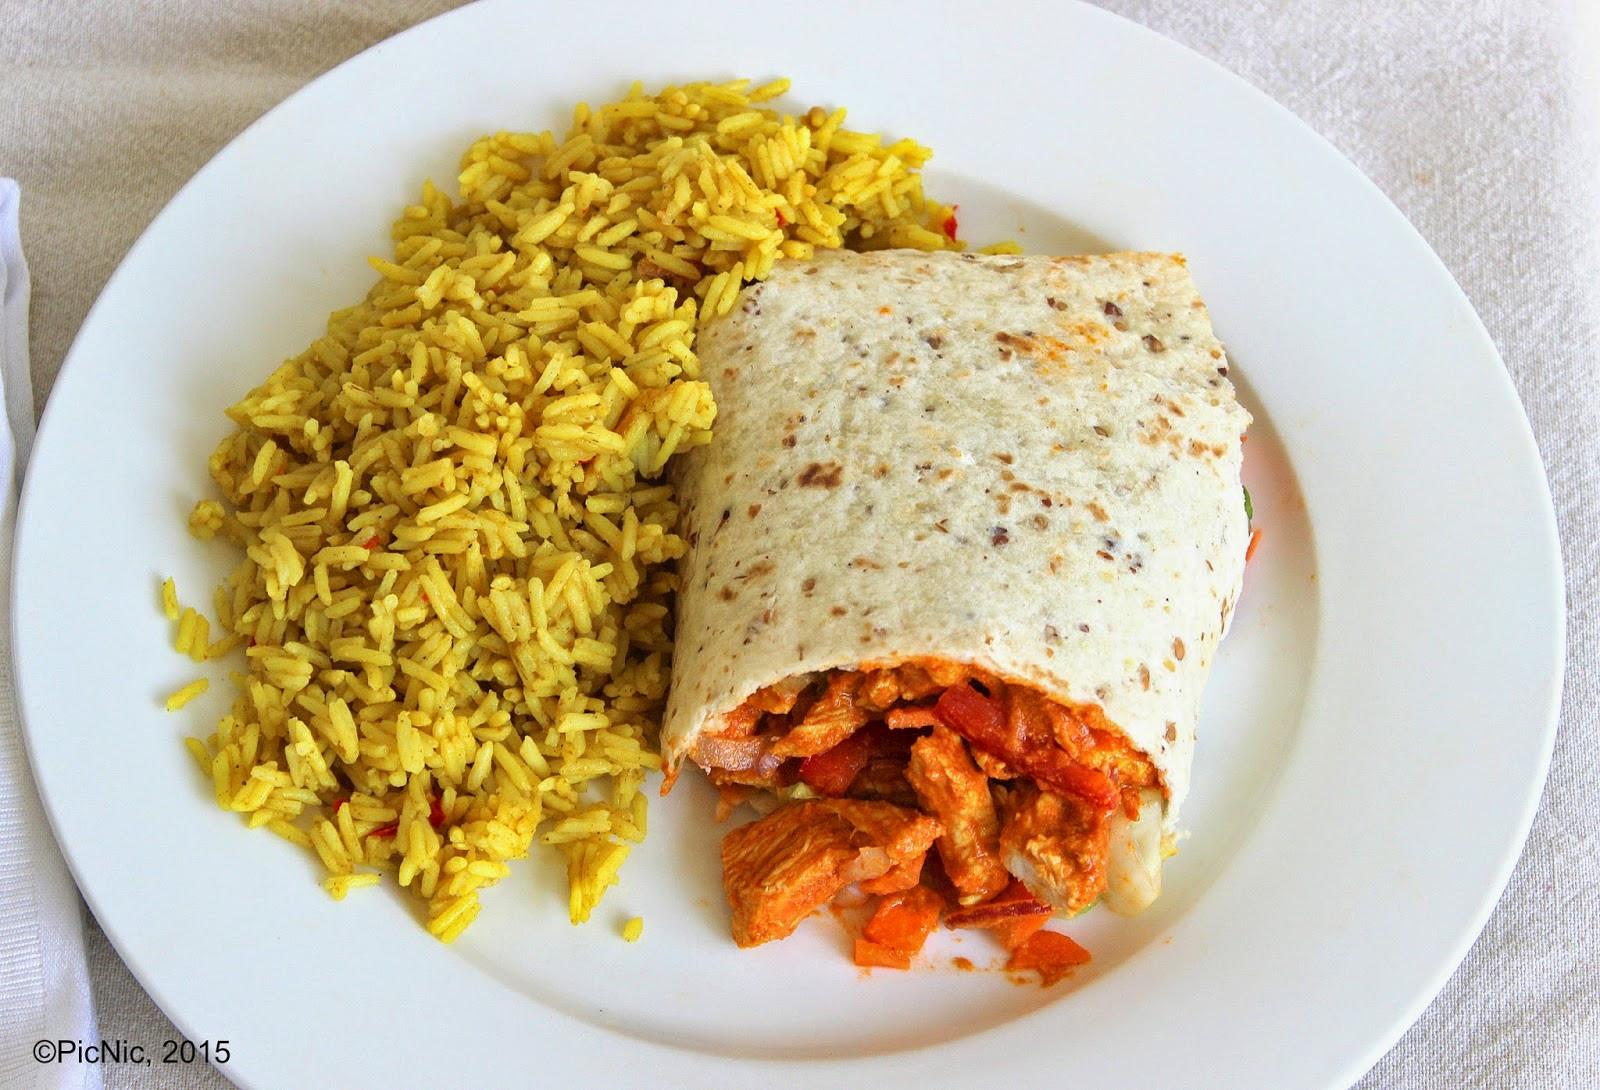 Tandoori Chicken Side Dishes  PicNic Tandoori Chicken Wraps